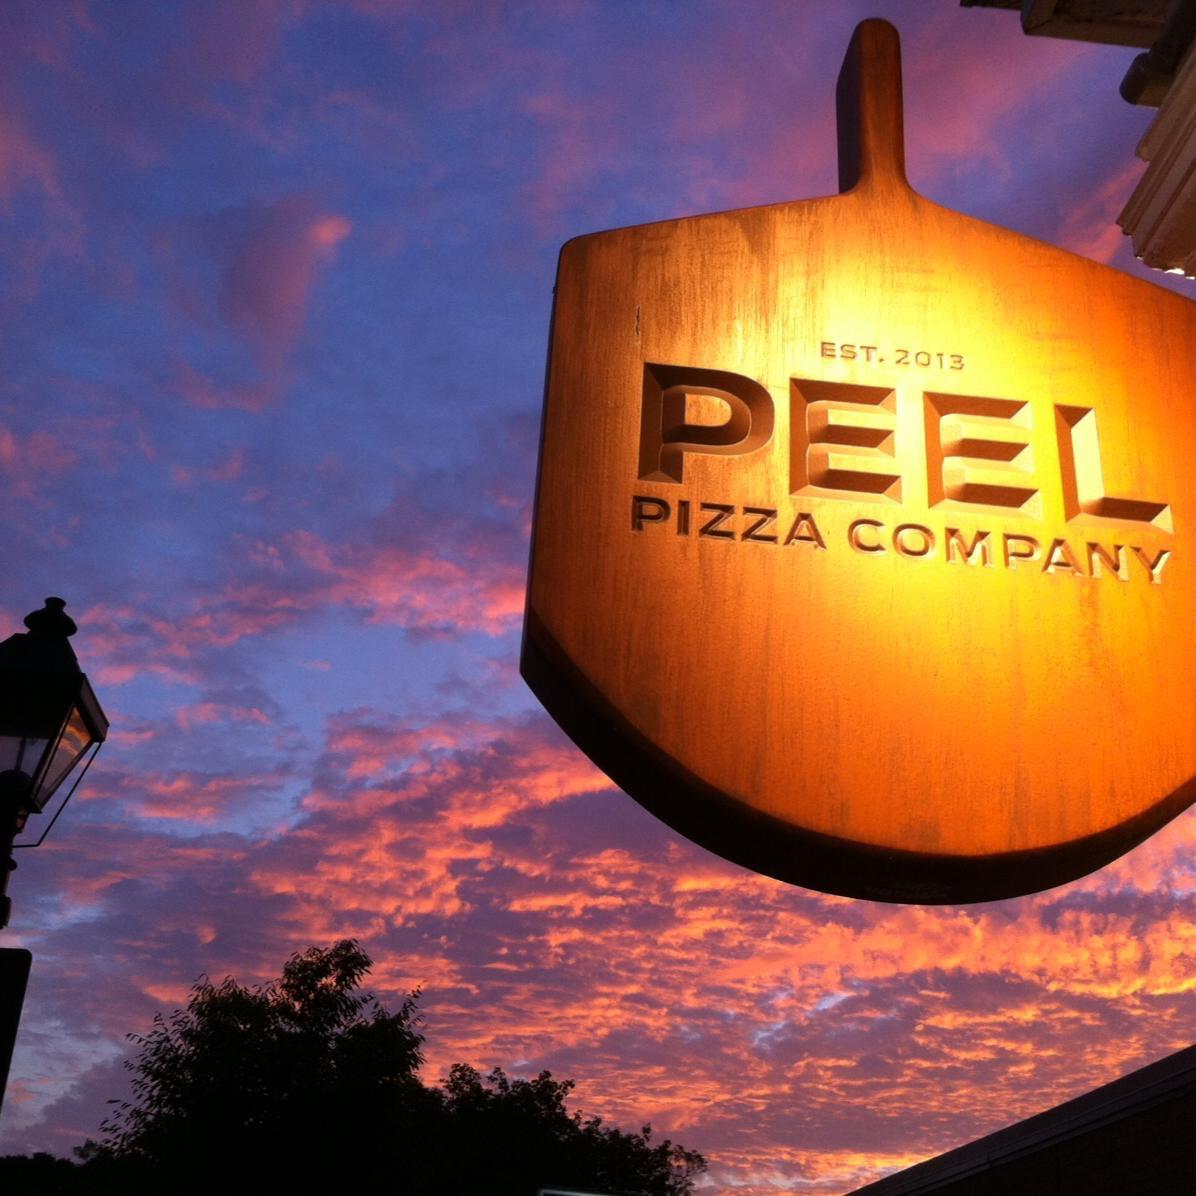 Rustic Kitchen Hingham Menu: Peel Pizza Company-Hingham, Cohasset, Duxbury, Milton MA